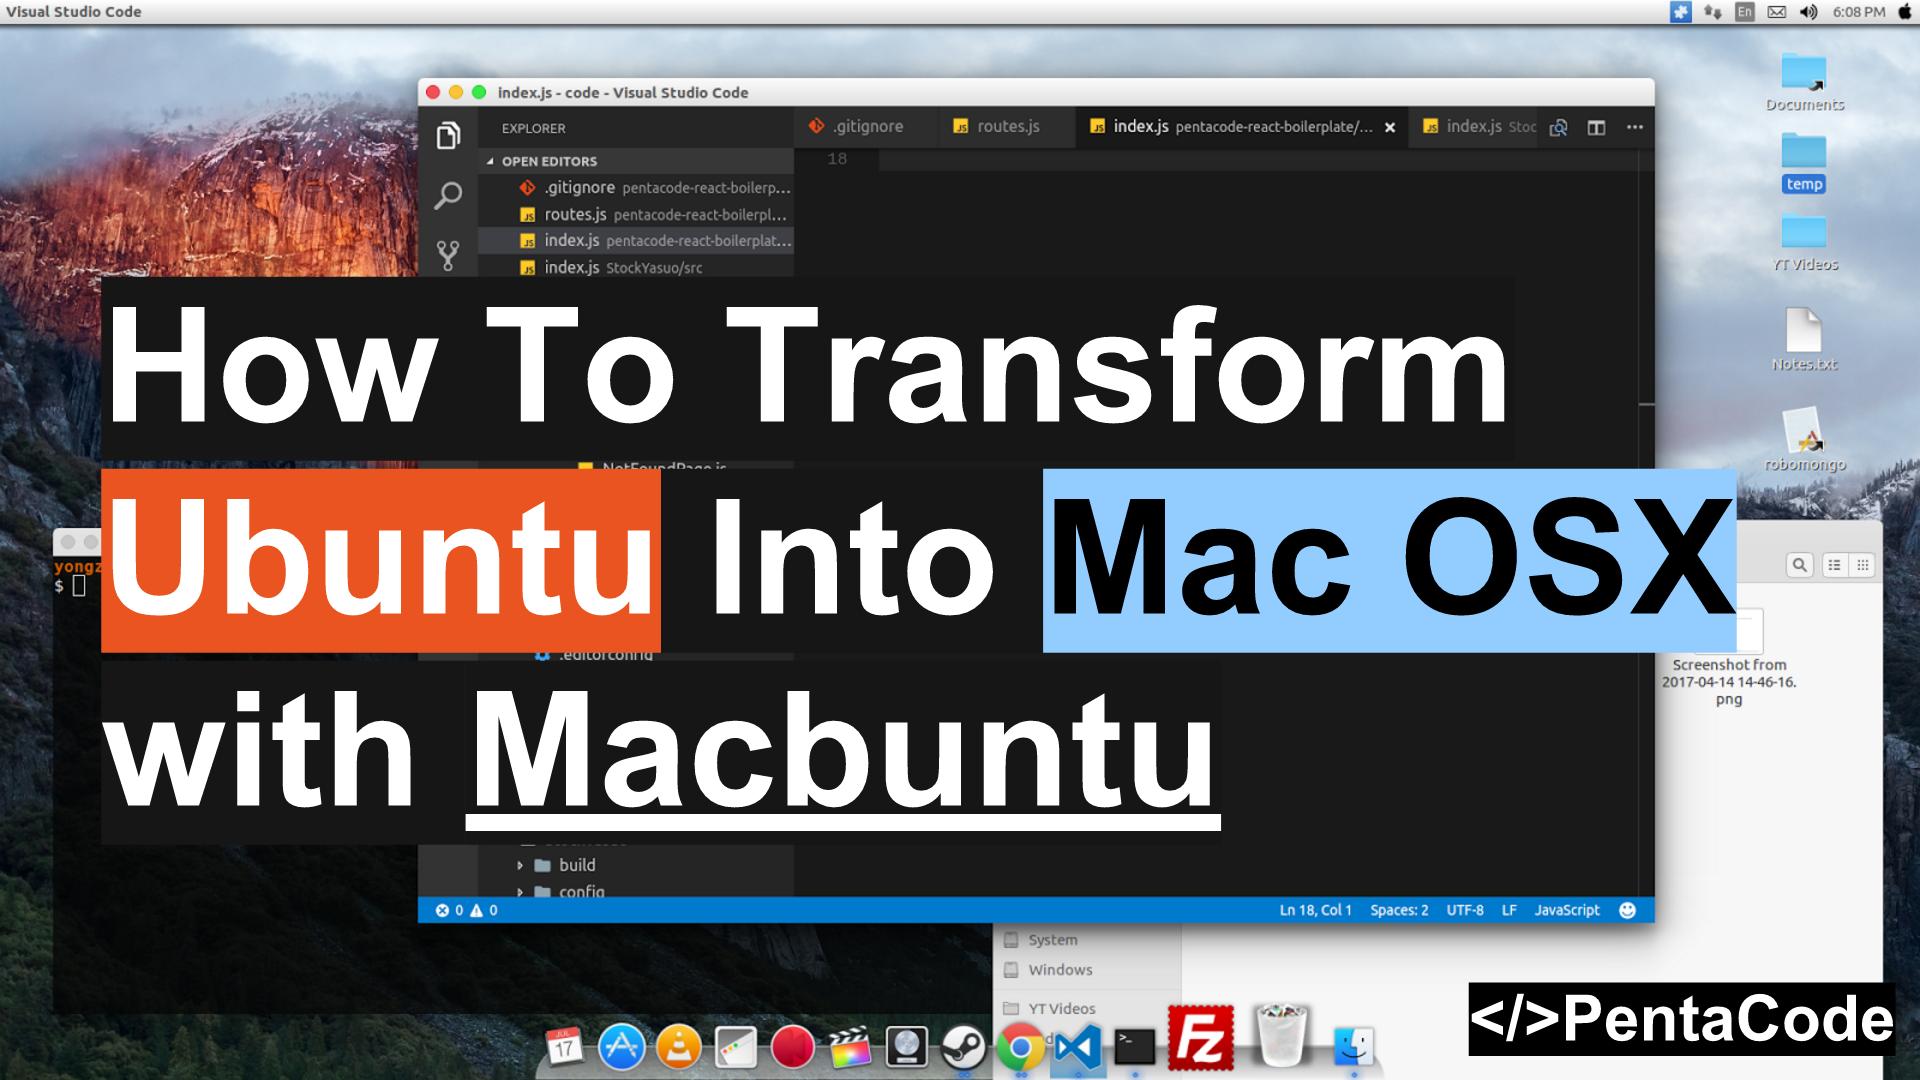 How To Transform Ubuntu Into Mac OSX with Macbuntu | Pentacode